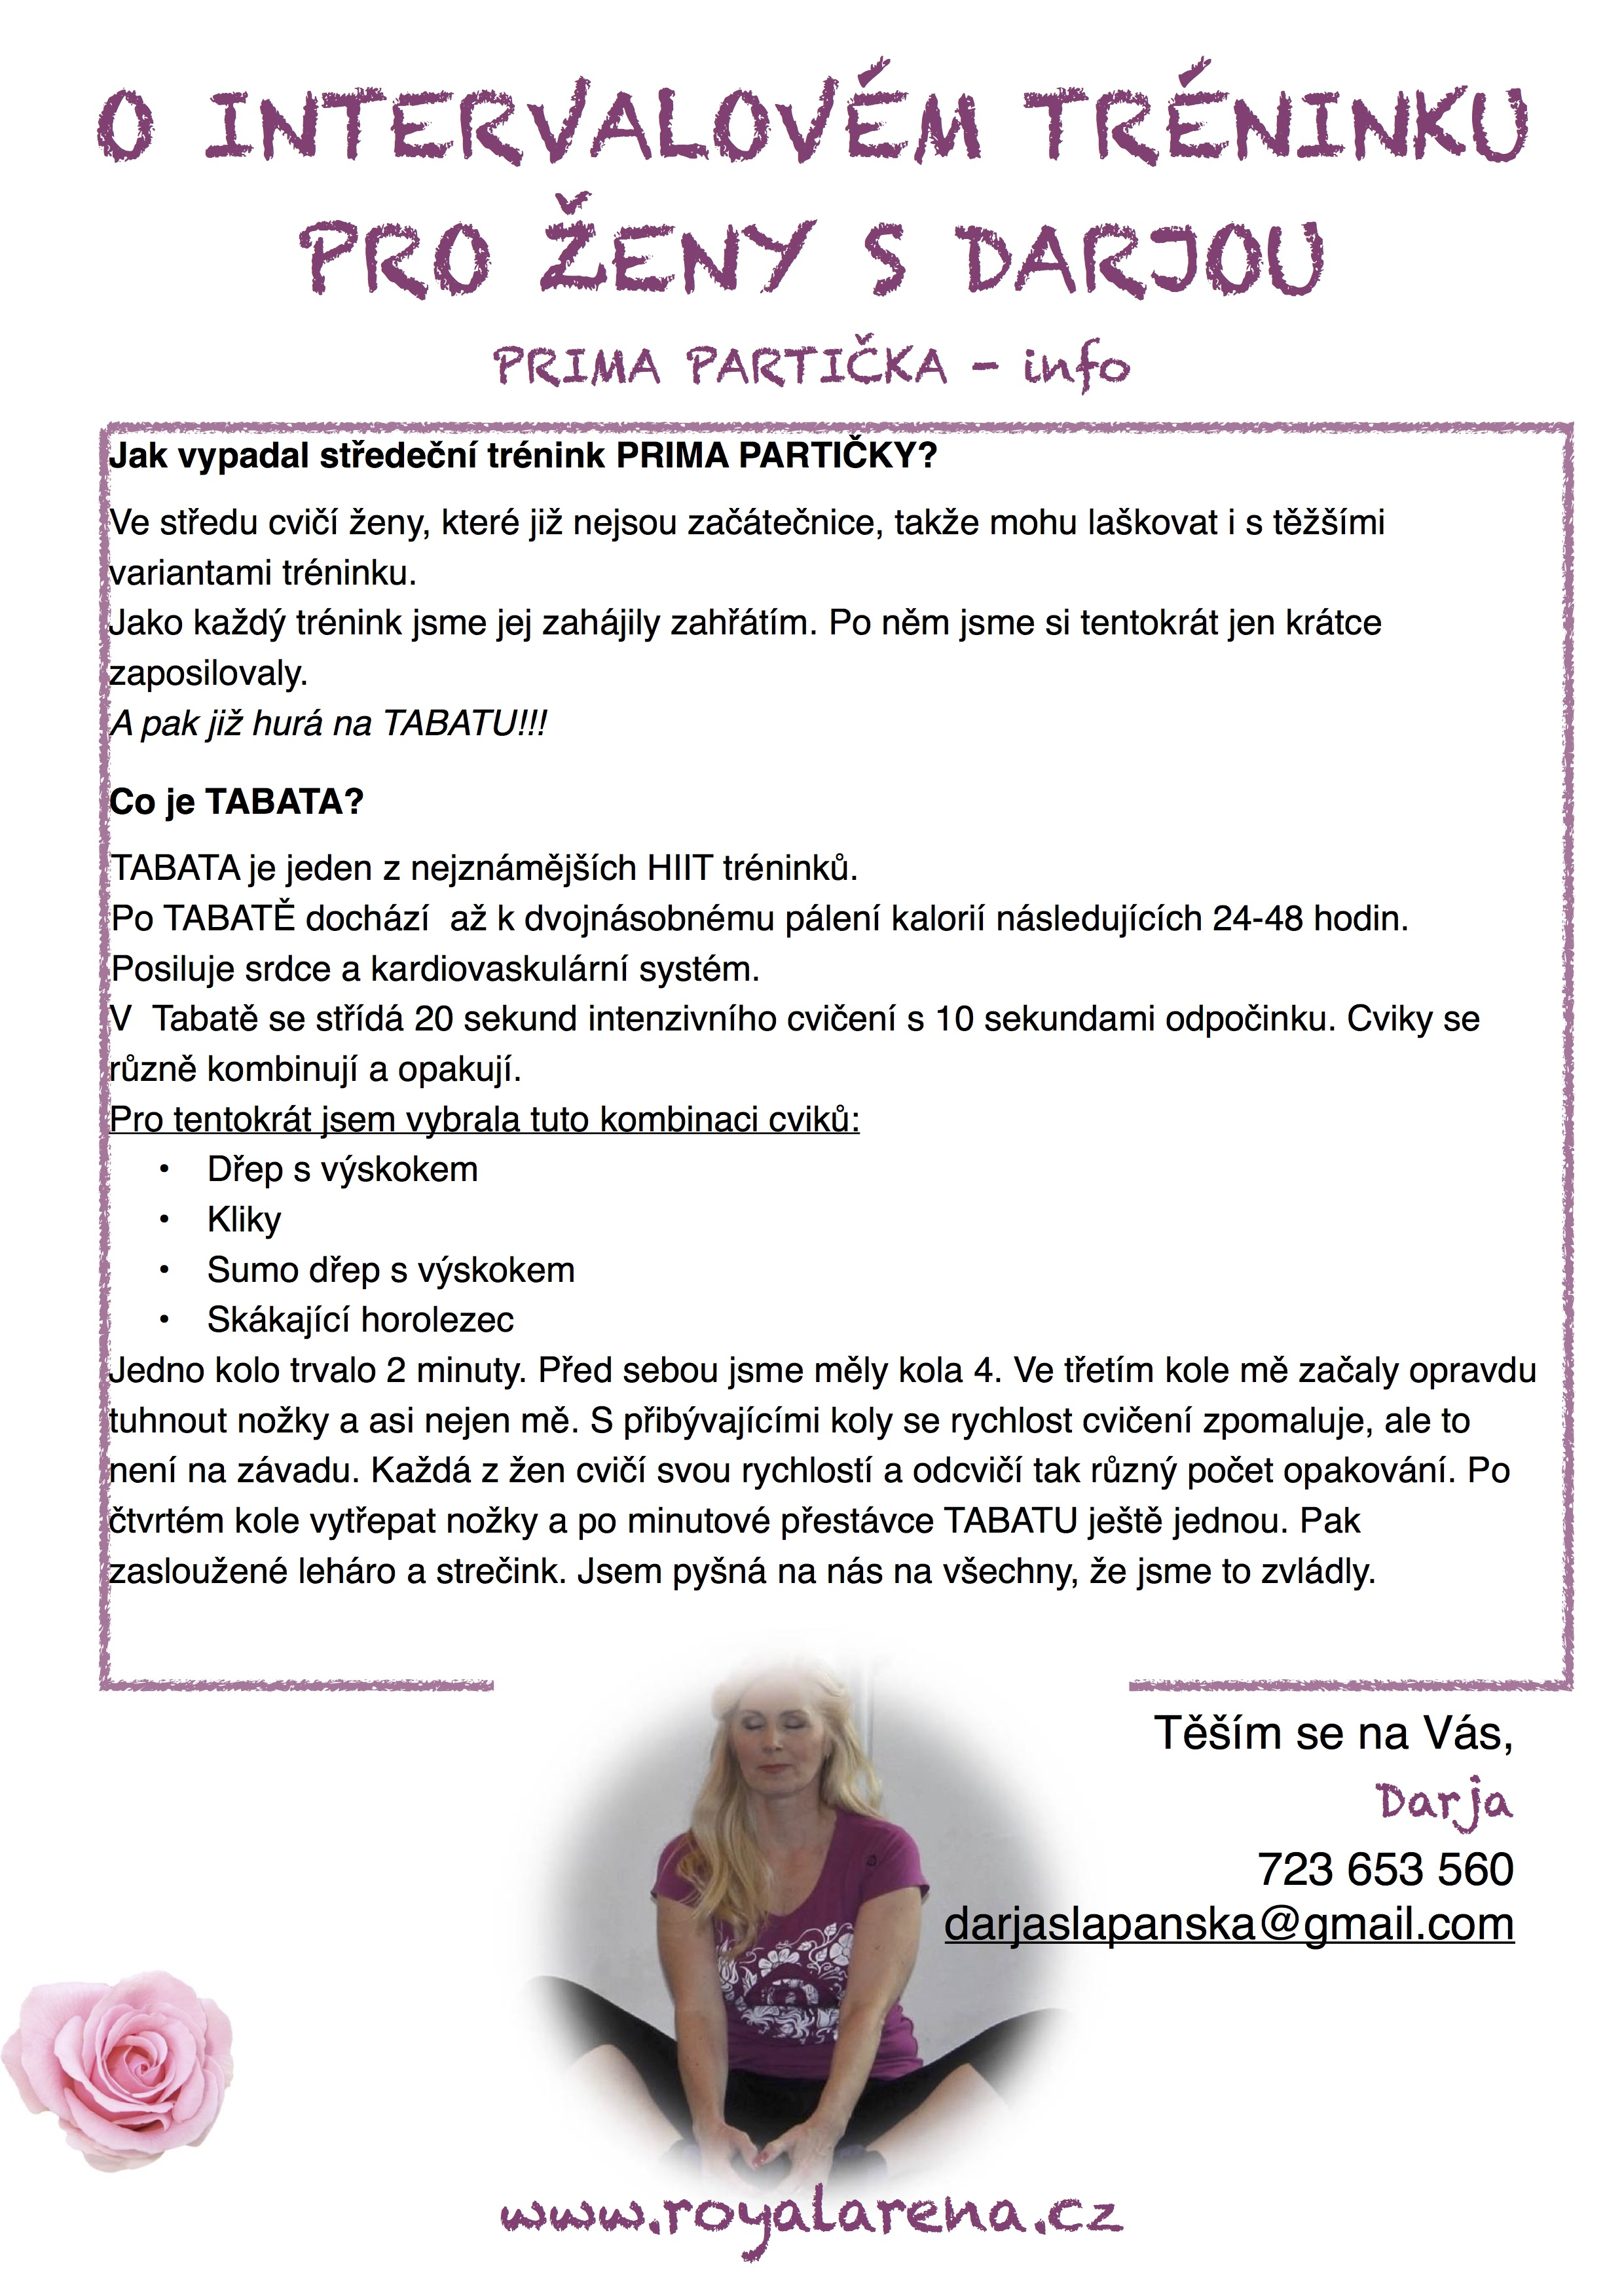 PP - trénink, tabata, 1